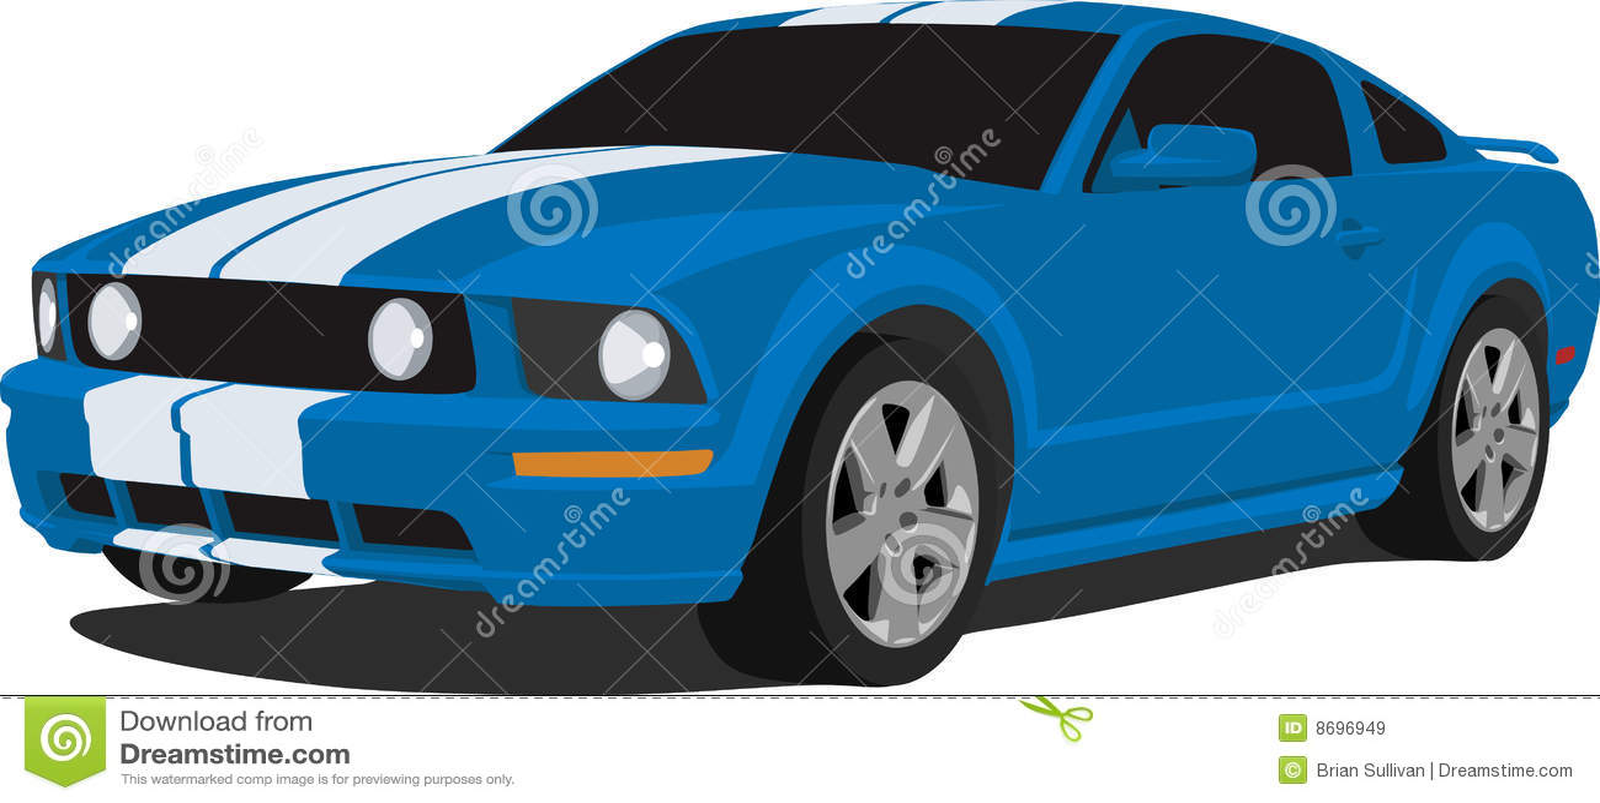 2005 Ford Mustang Gt Stock Vector Illustration Of Modern 8696949